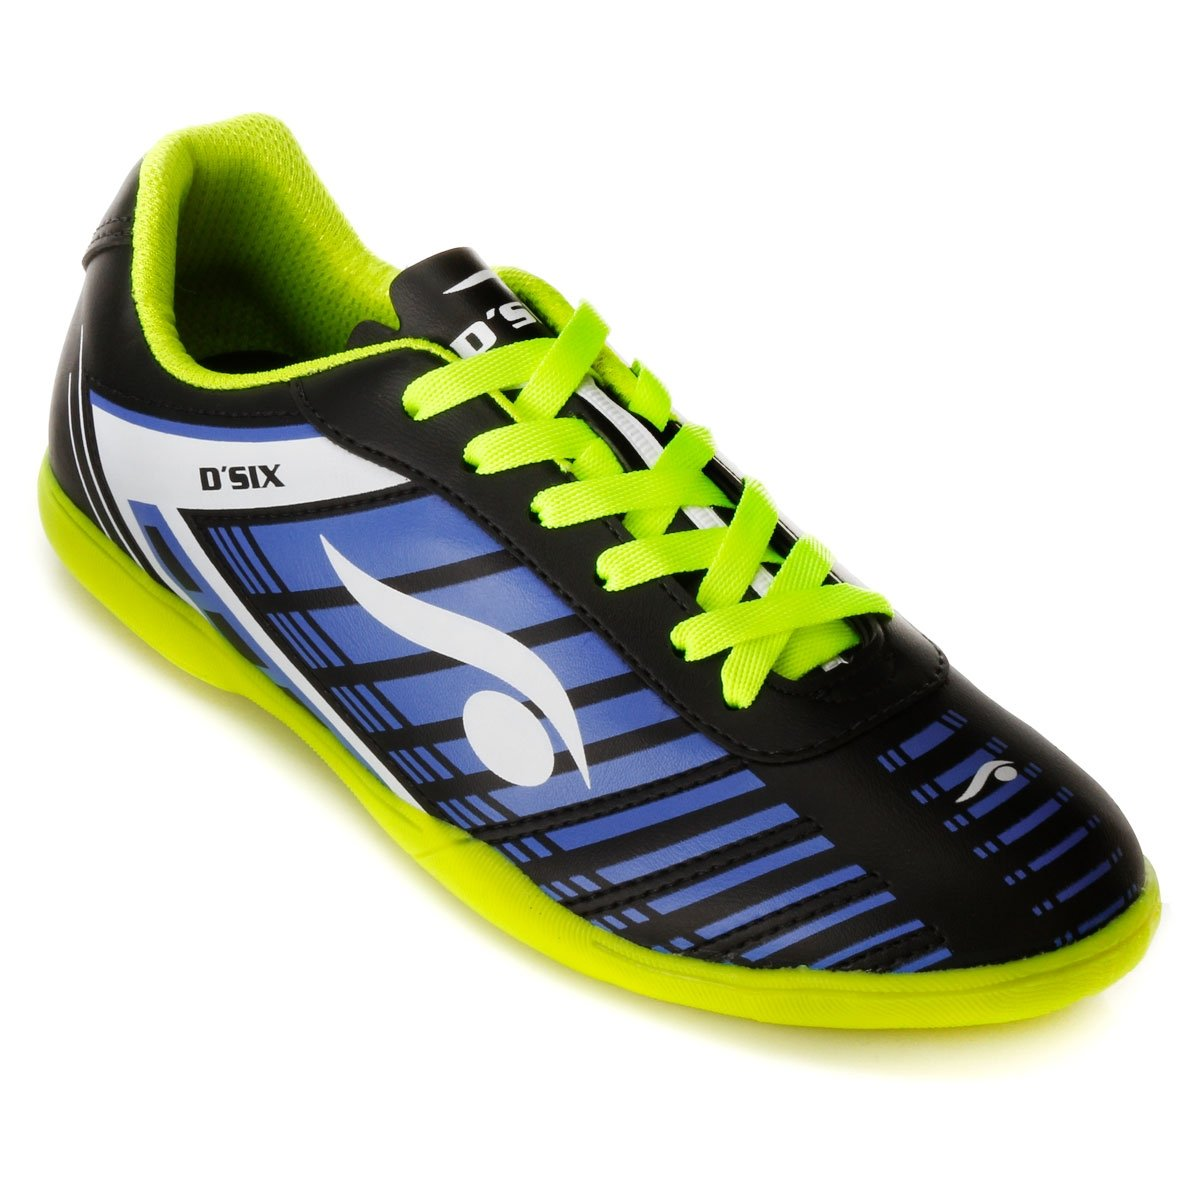 Tênis Futsal Dsix D17-6202 - Compre Agora  b1132a9b44517